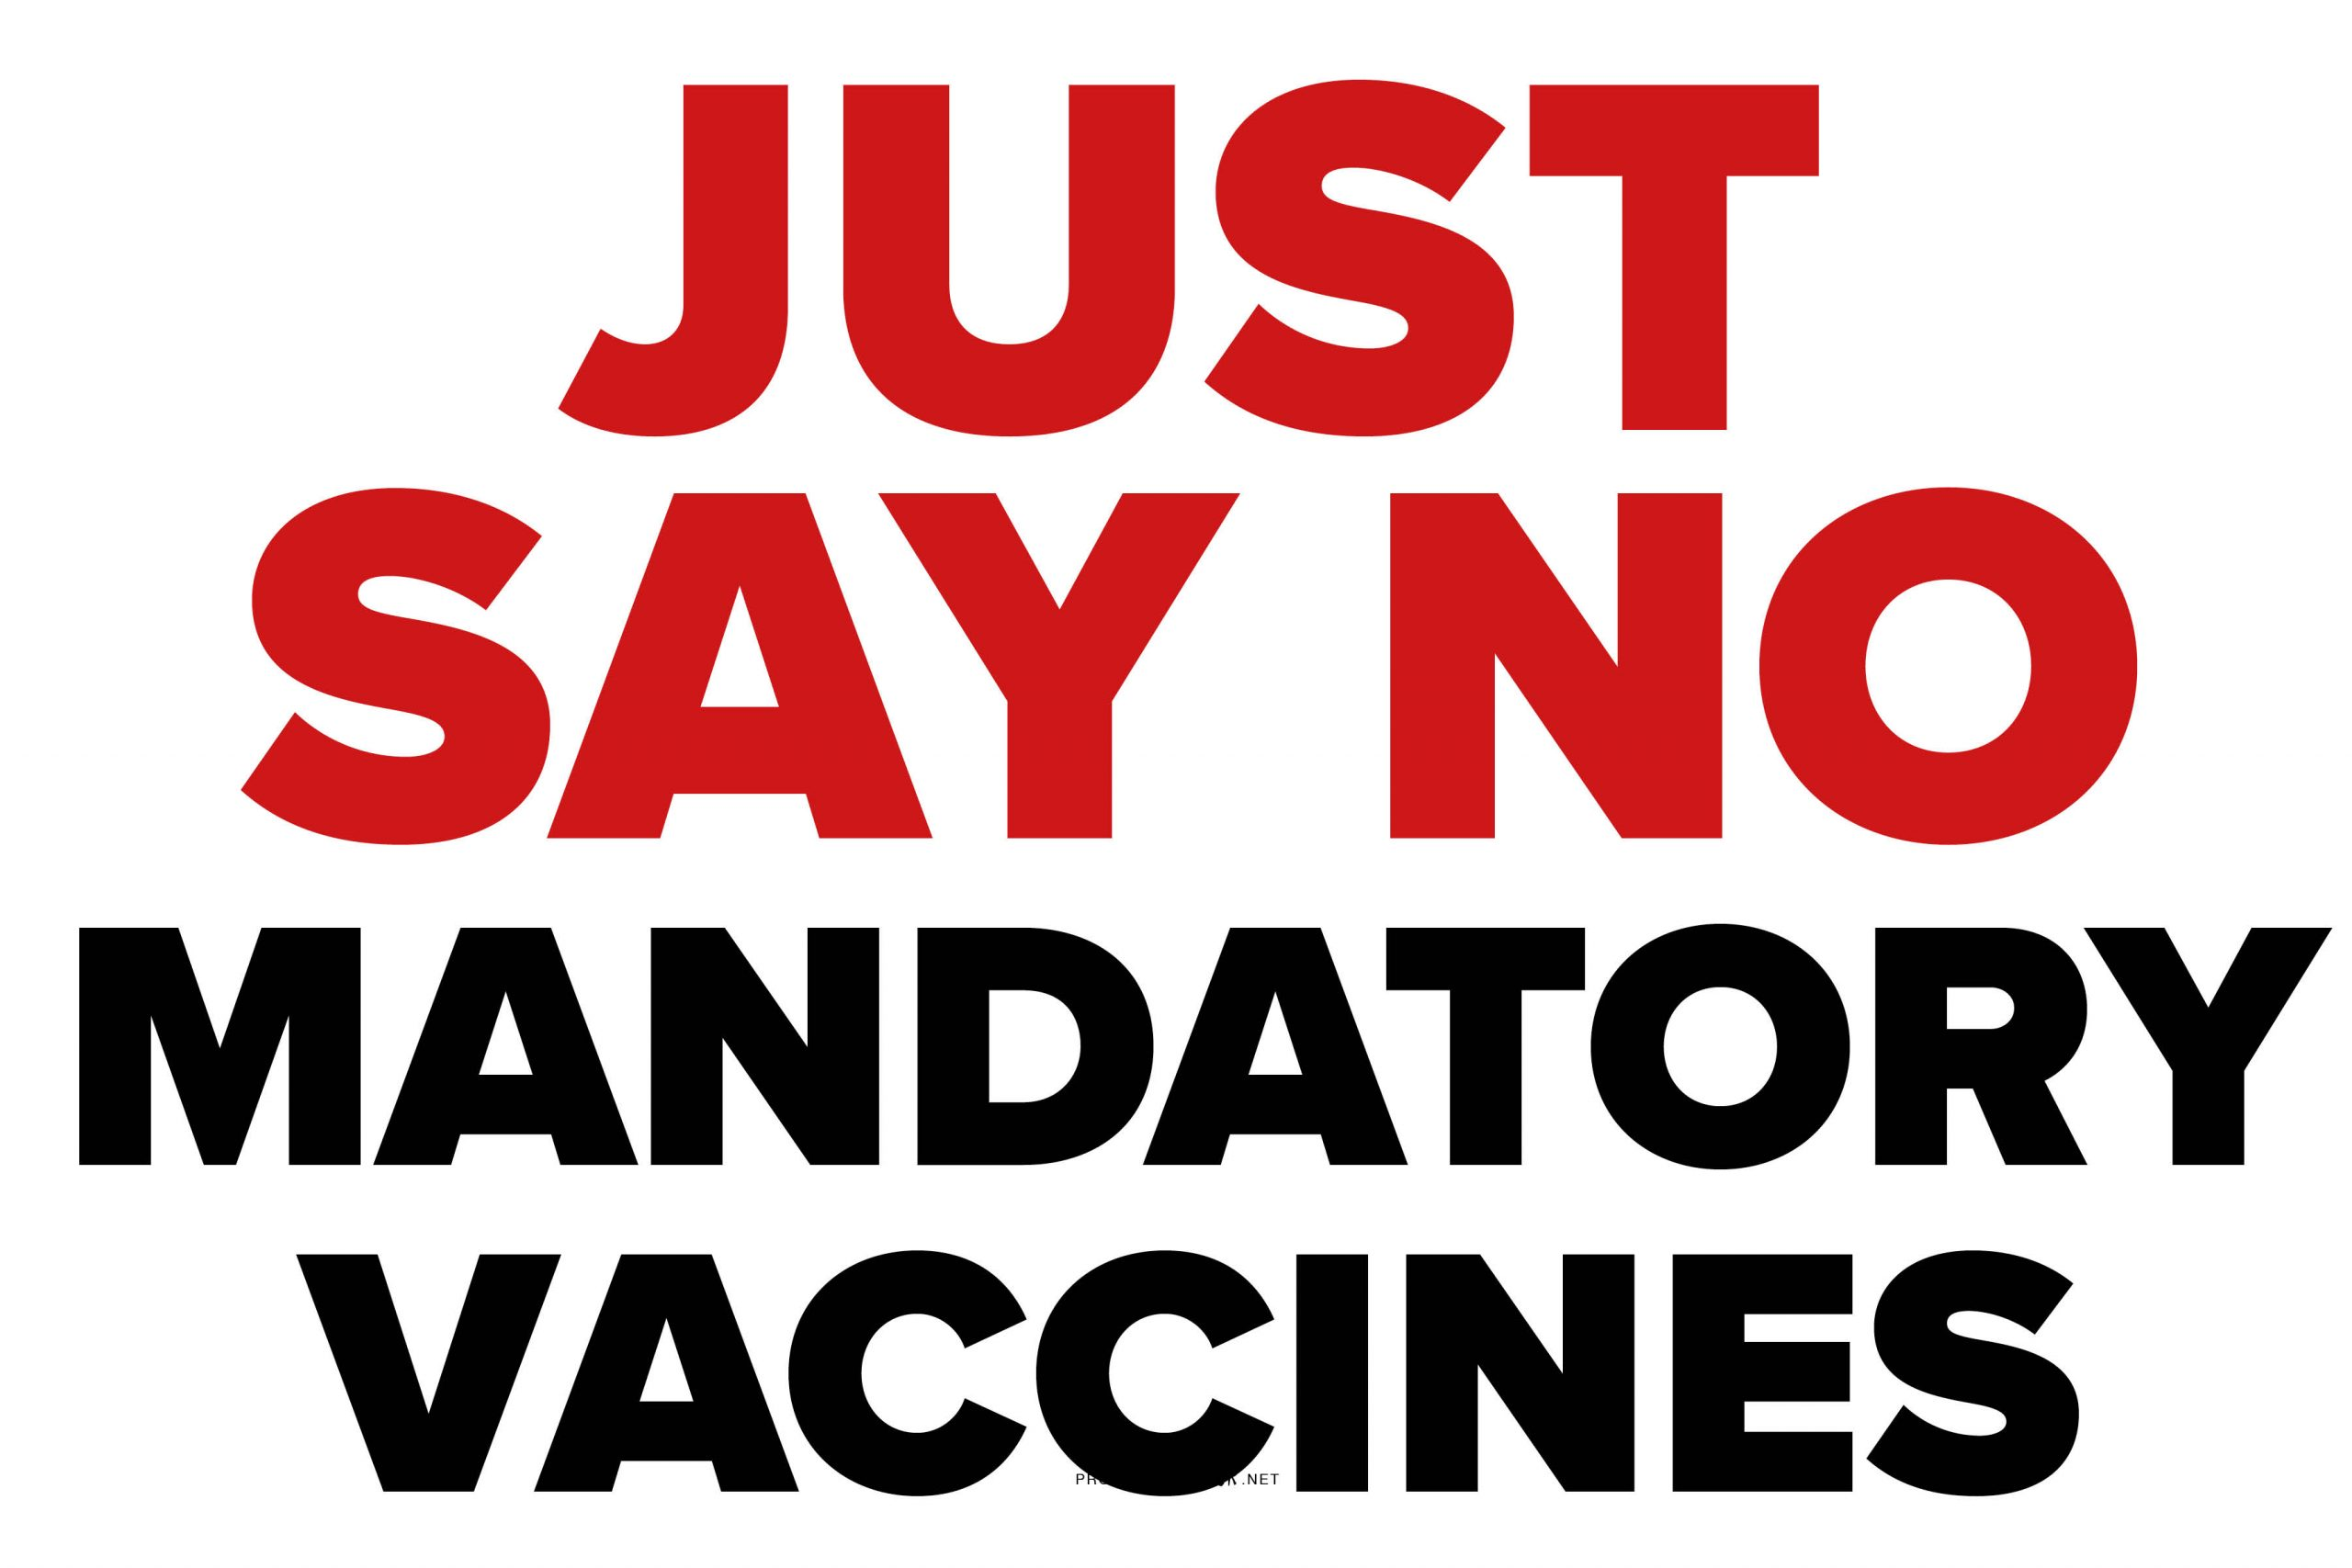 No Mandatory Vaccines